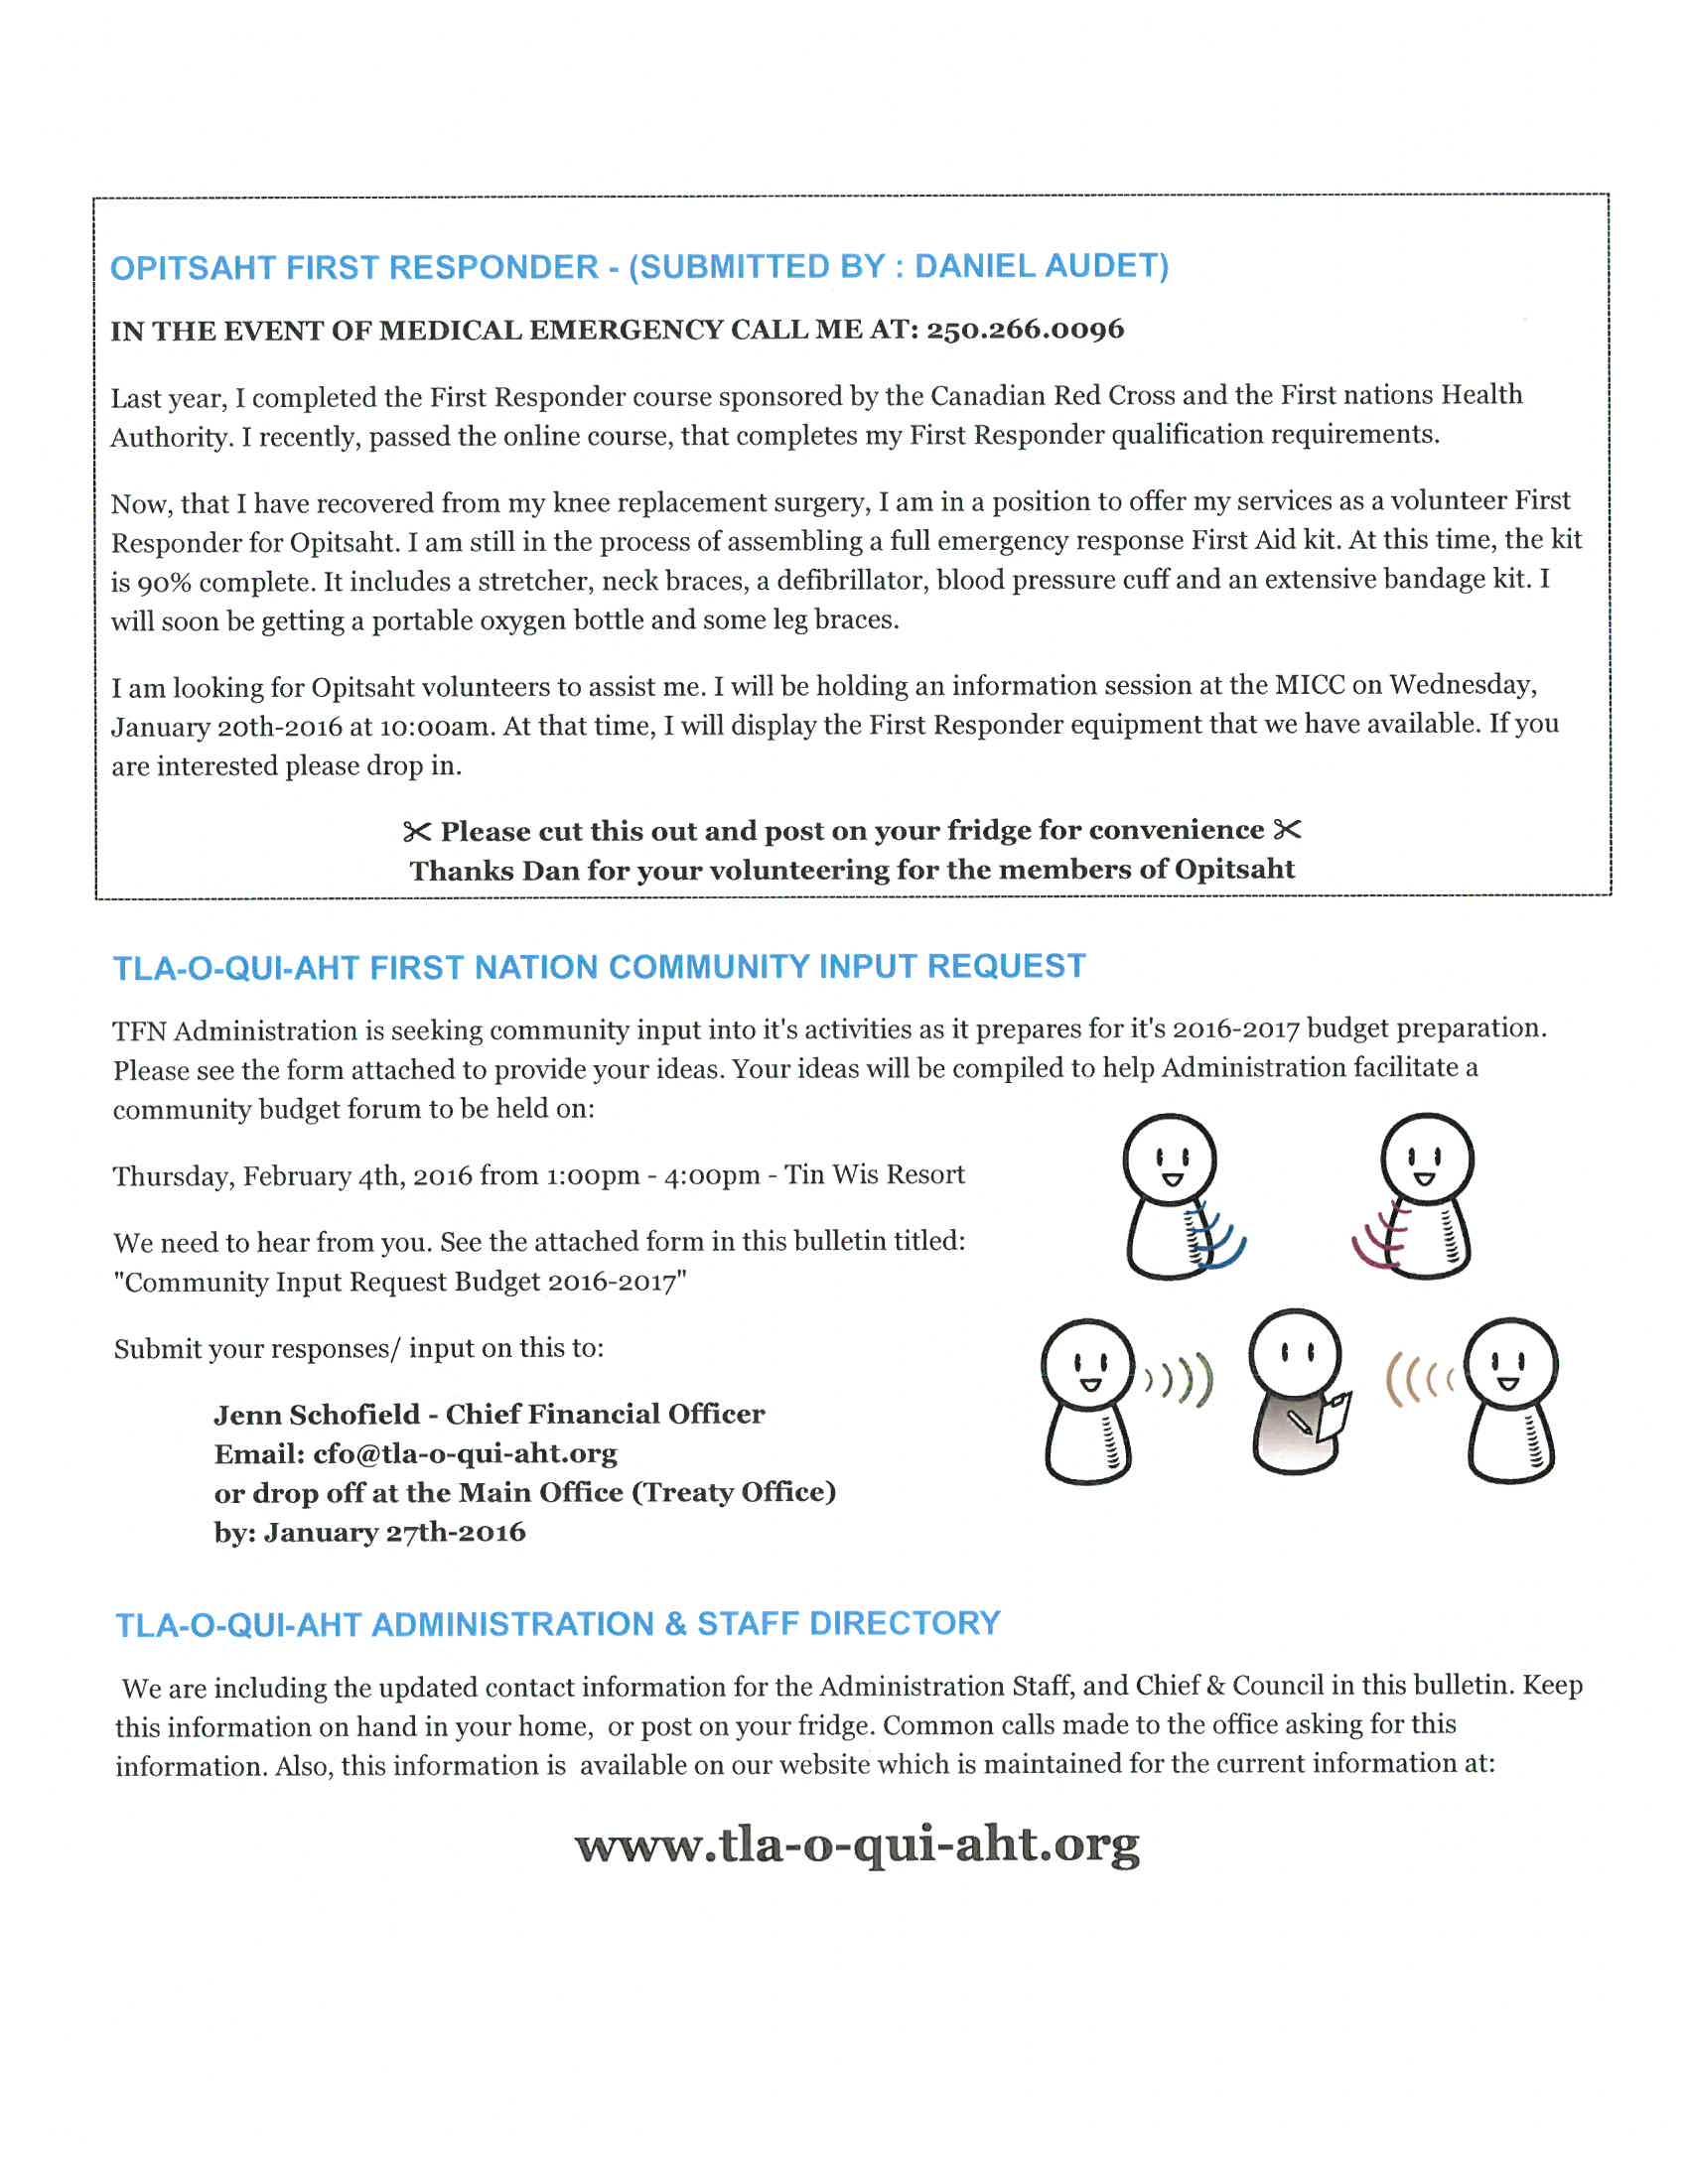 TFN Bulletin Jan 15-2016_Page_04.jpg